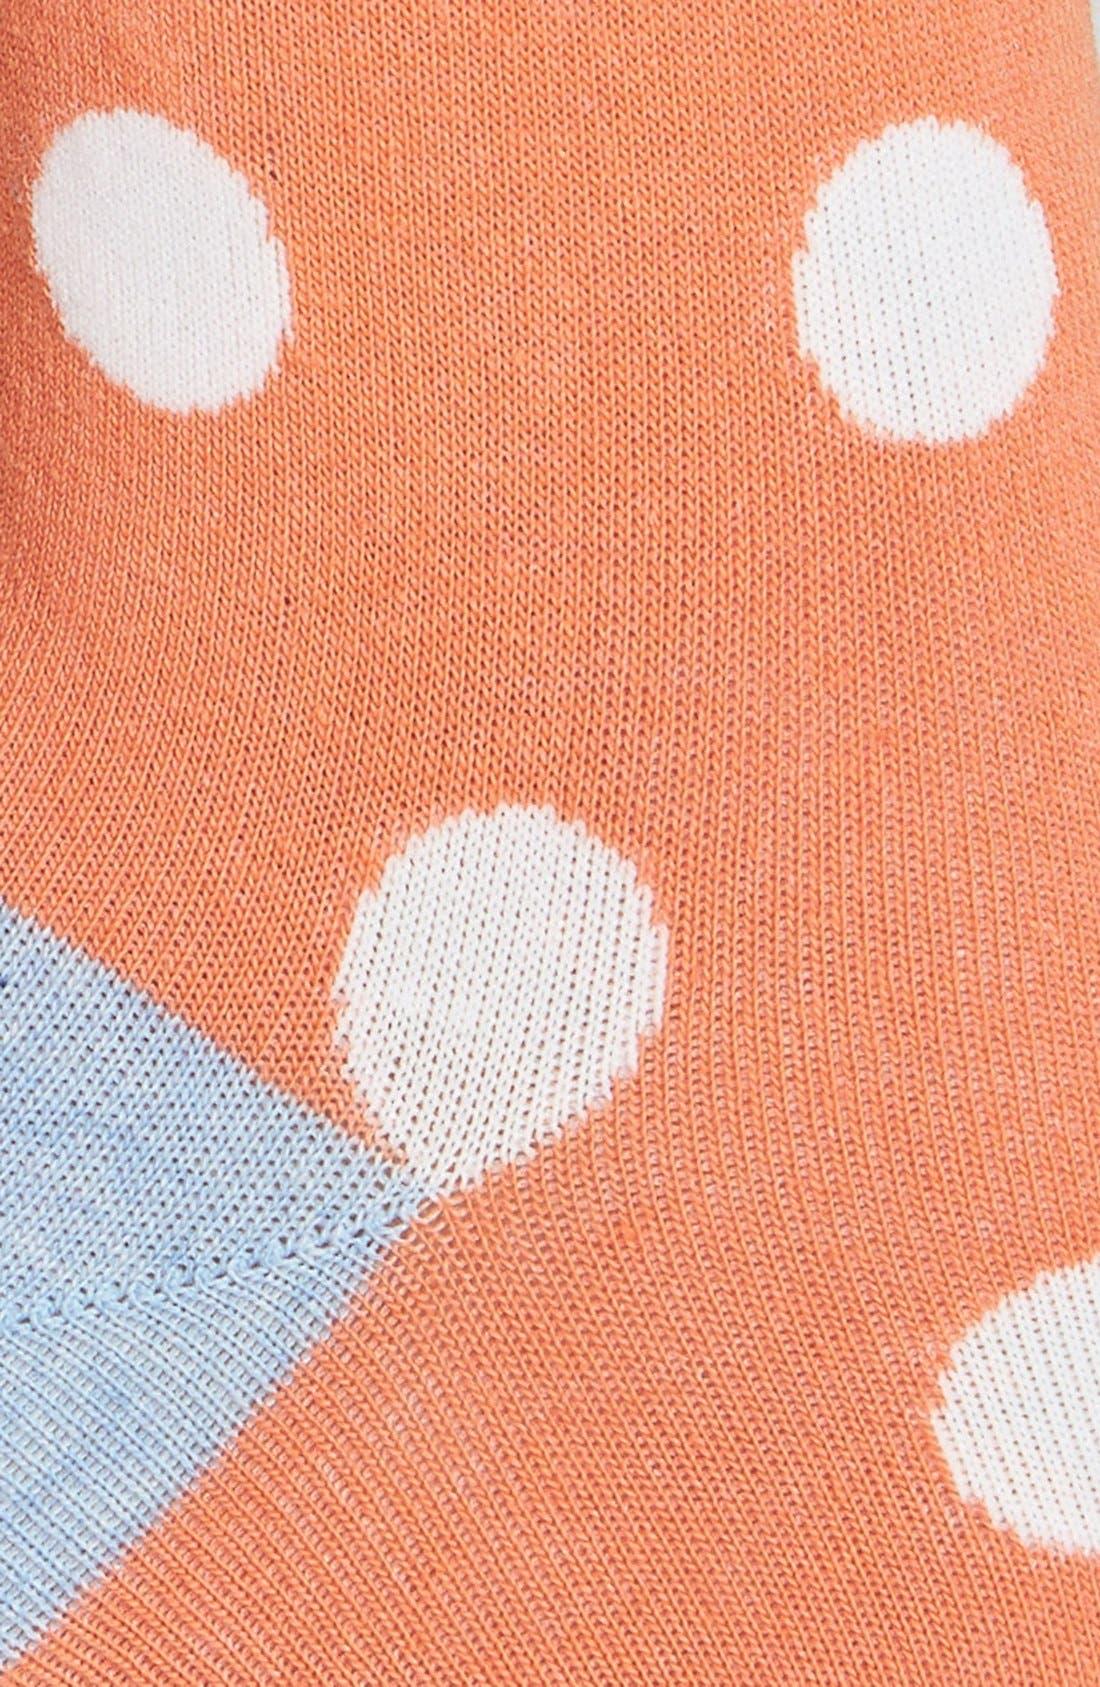 Alternate Image 2  - Hot Sox 'Large Dot' Crew Socks